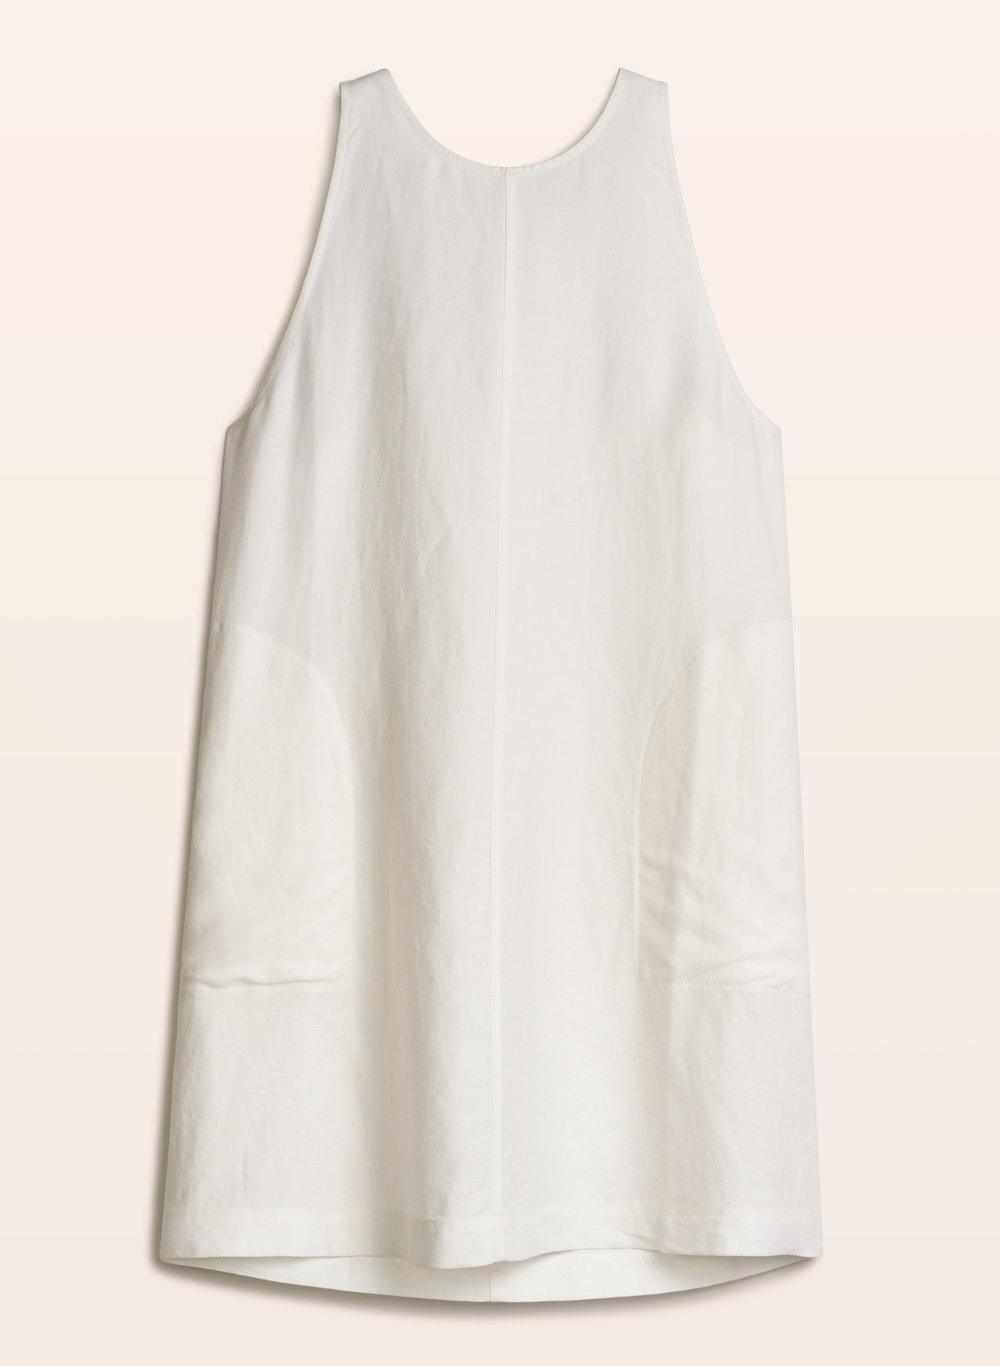 Wilfred trompette dress white.jpg